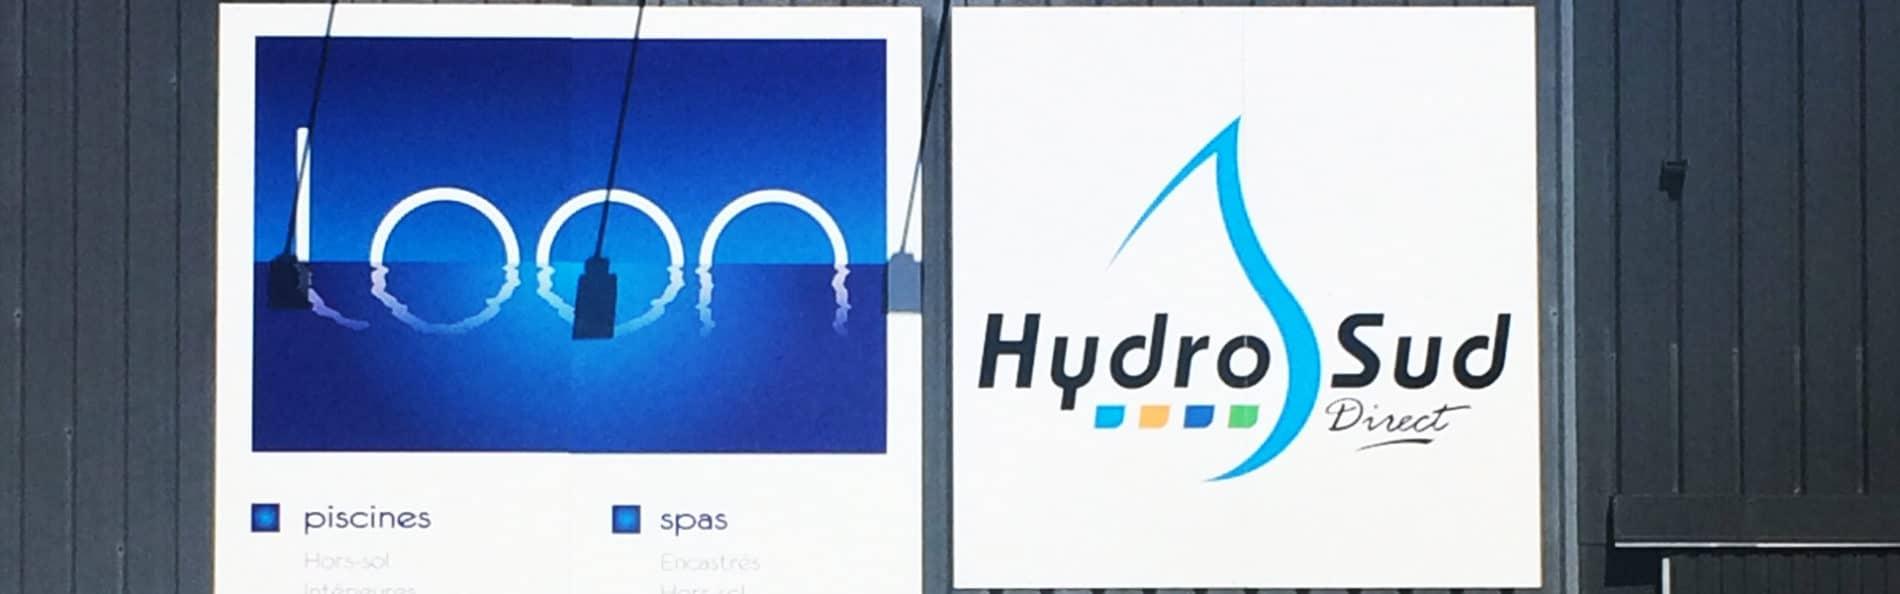 Loon Piscines et Spas – Hydro Sud Besançon